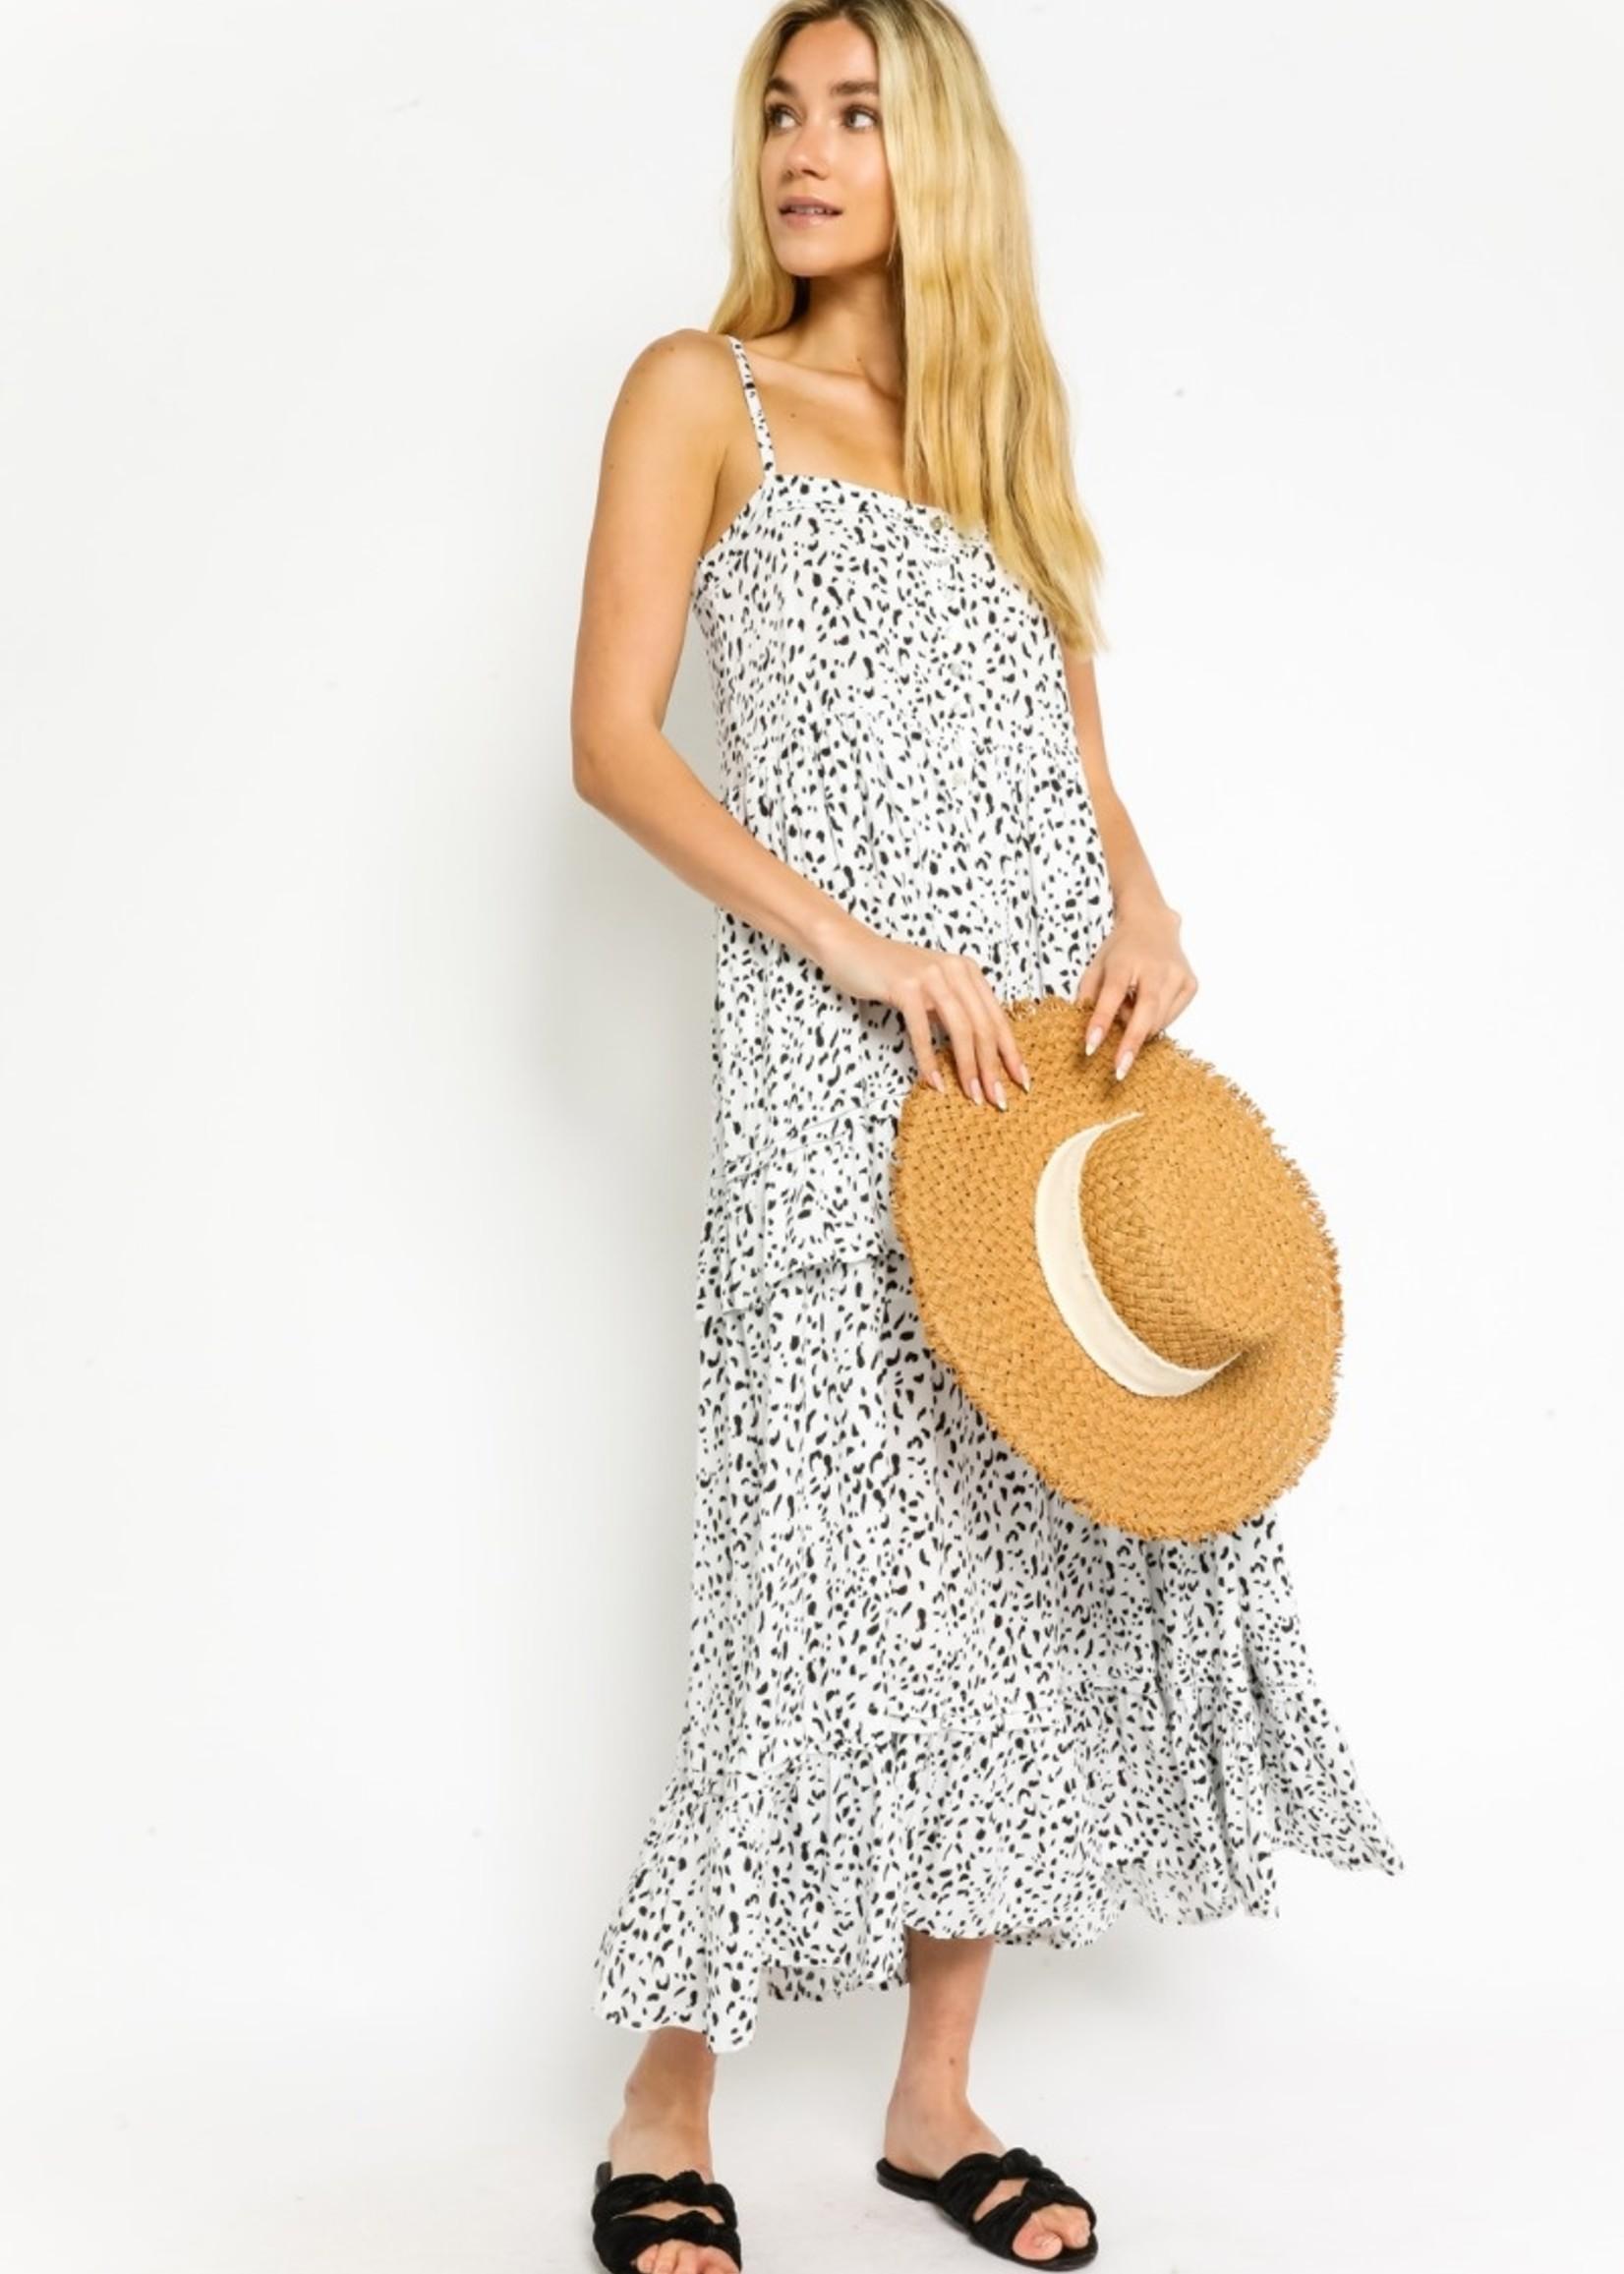 Picnic Date Dress